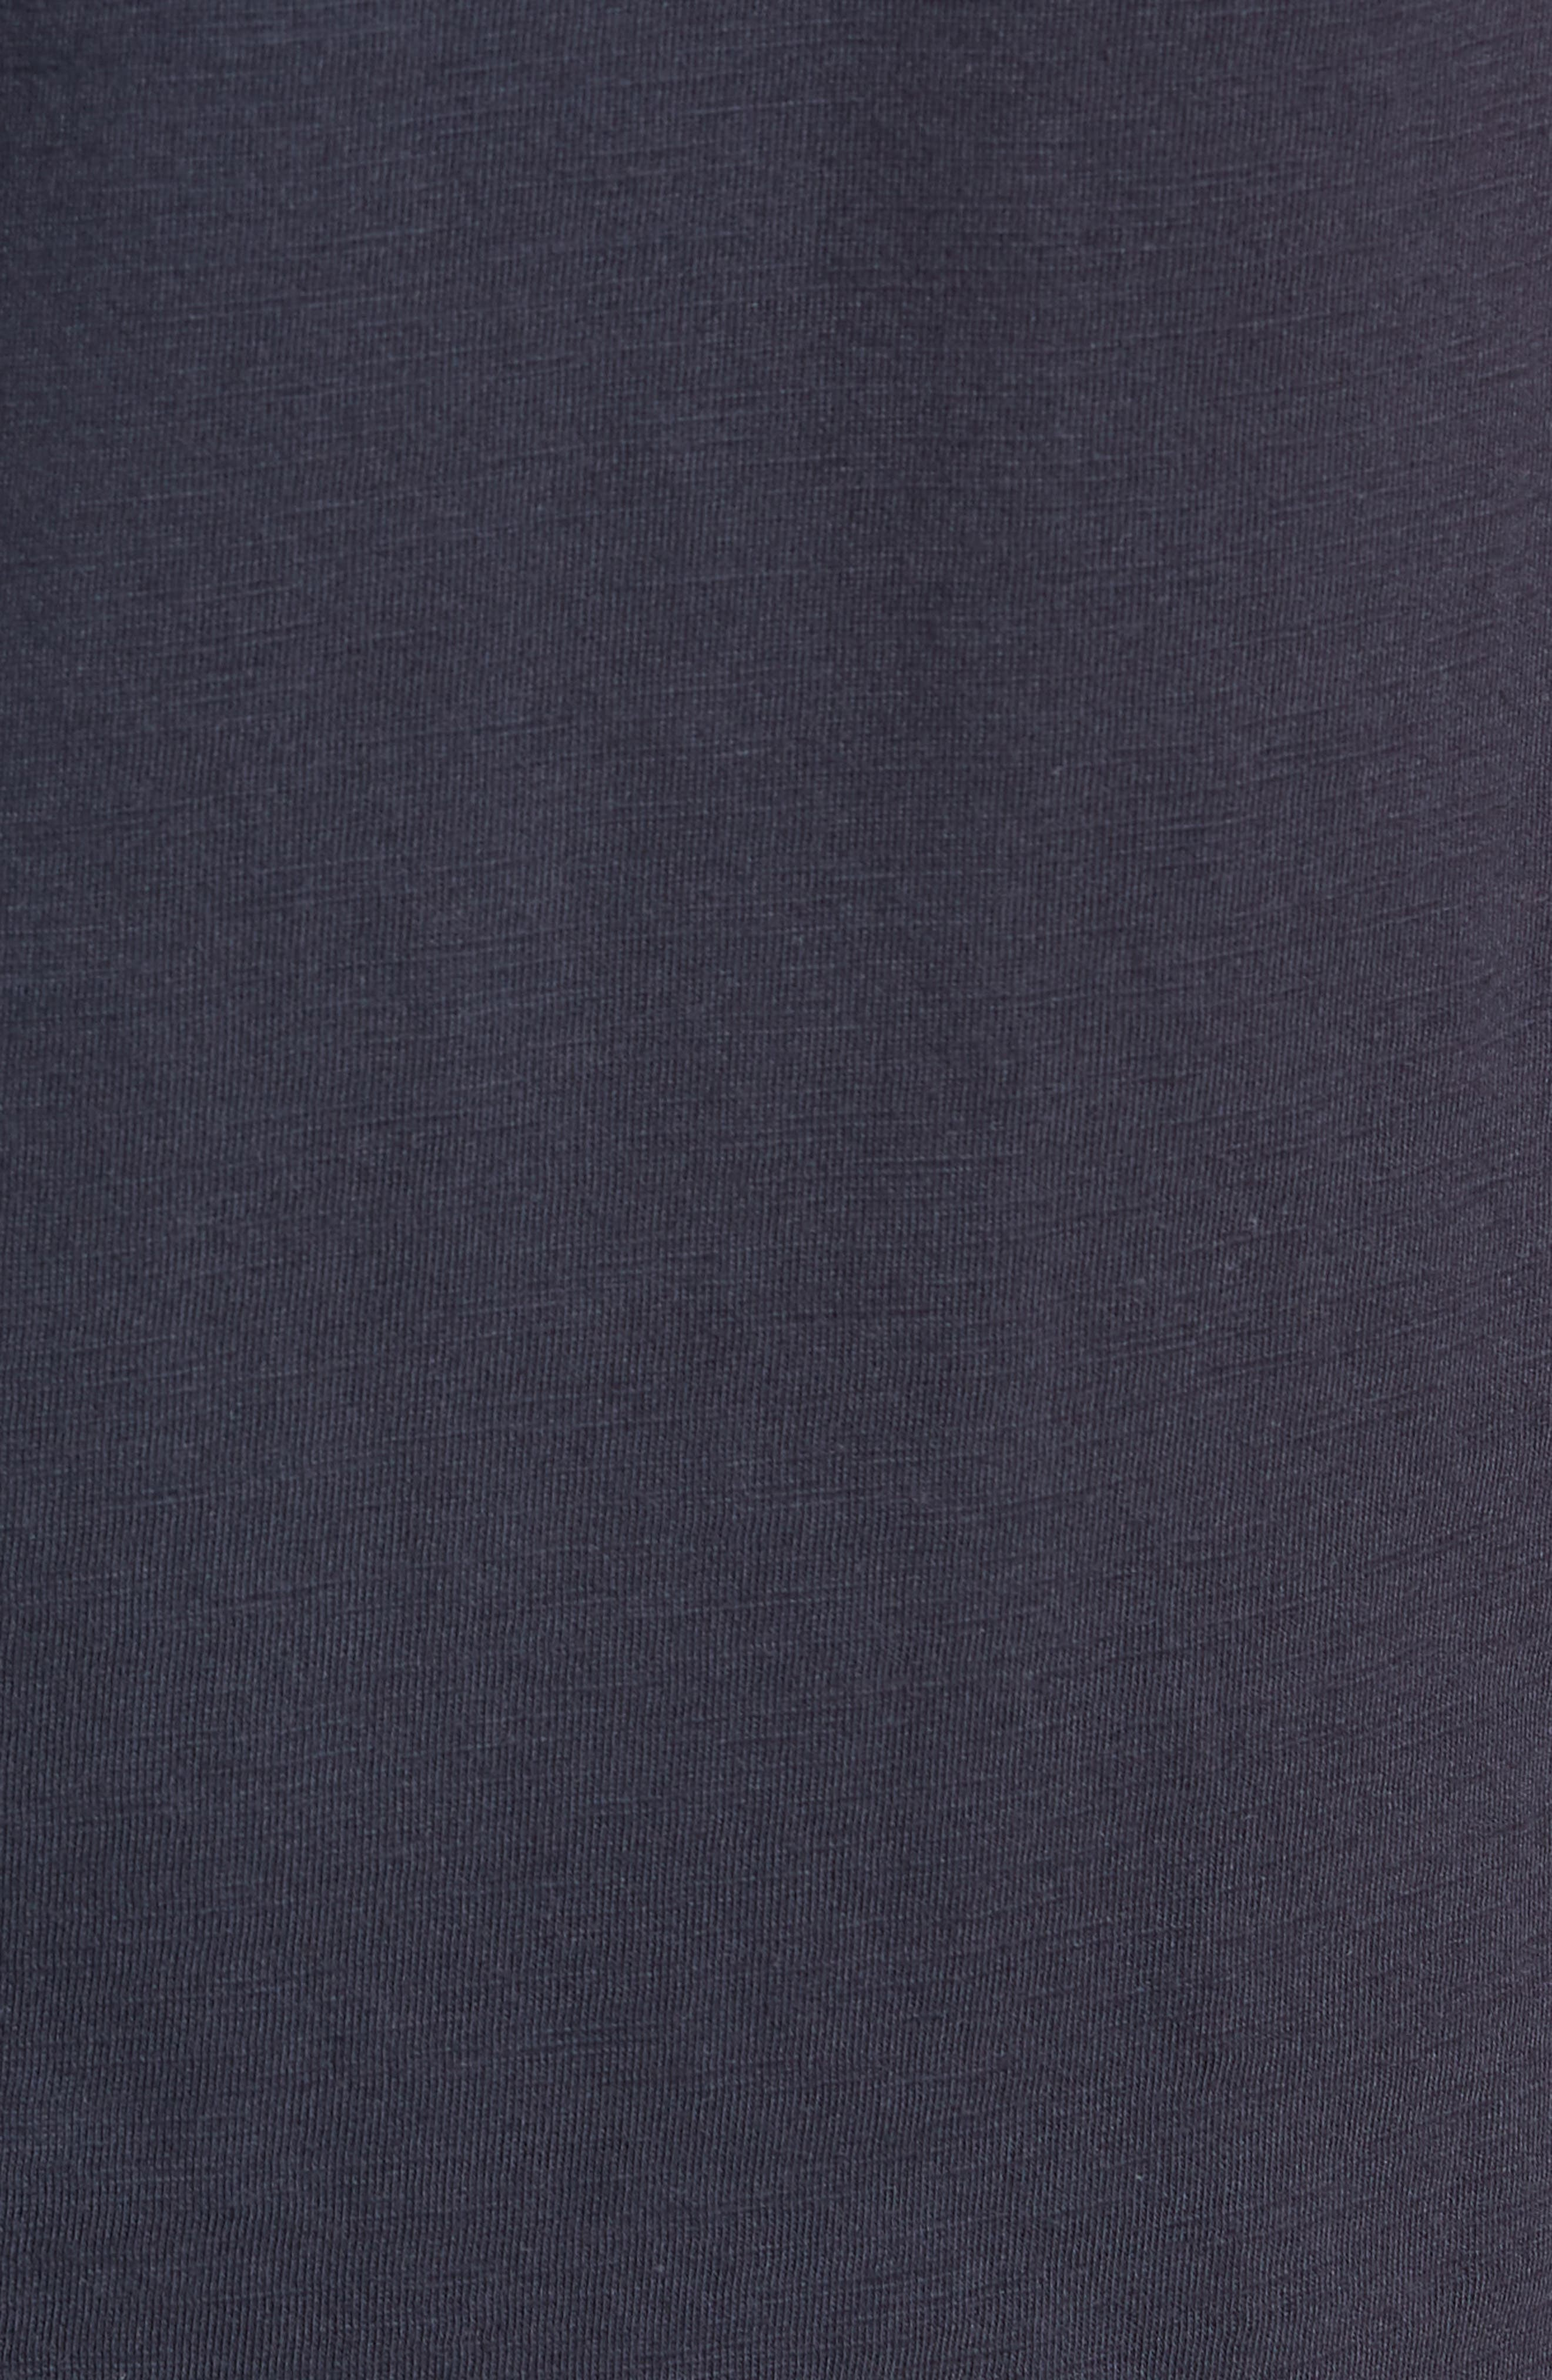 Soccer V-Neck T-Shirt,                             Alternate thumbnail 5, color,                             CARBON